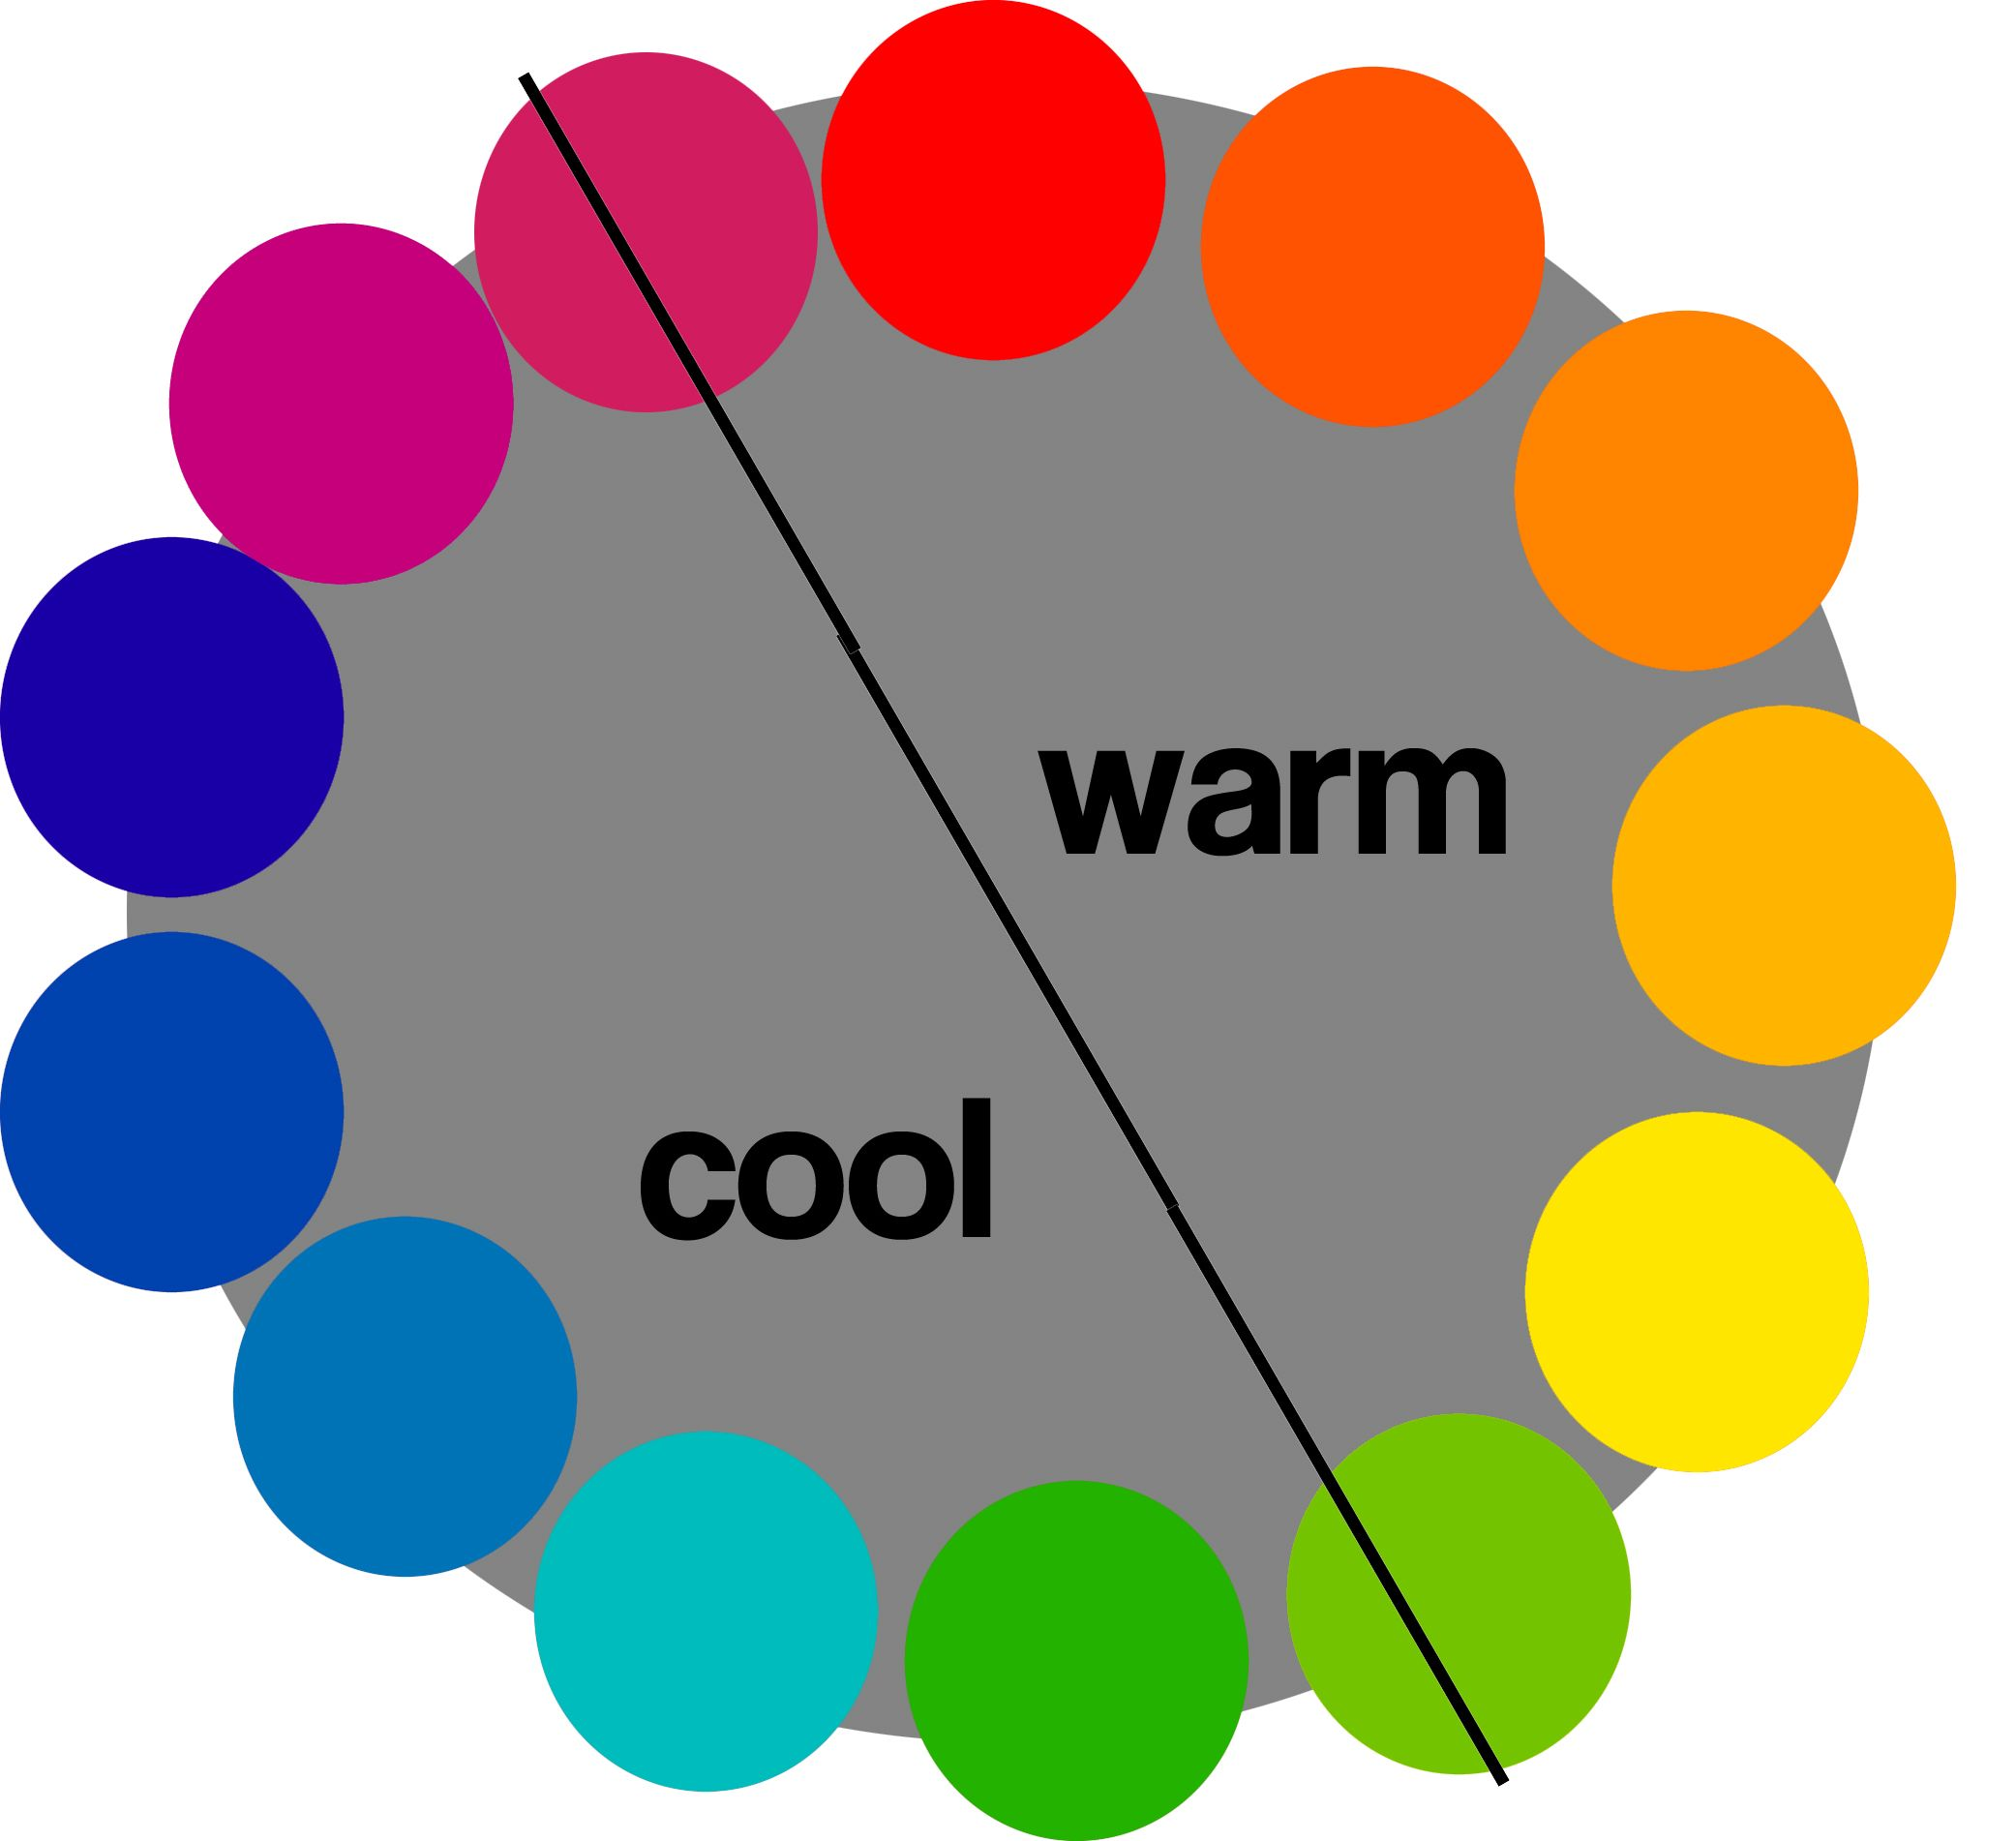 Color wheel online free - Cool Colors Vs Warm Colors Free Online Painting Course Blog Archive Warm